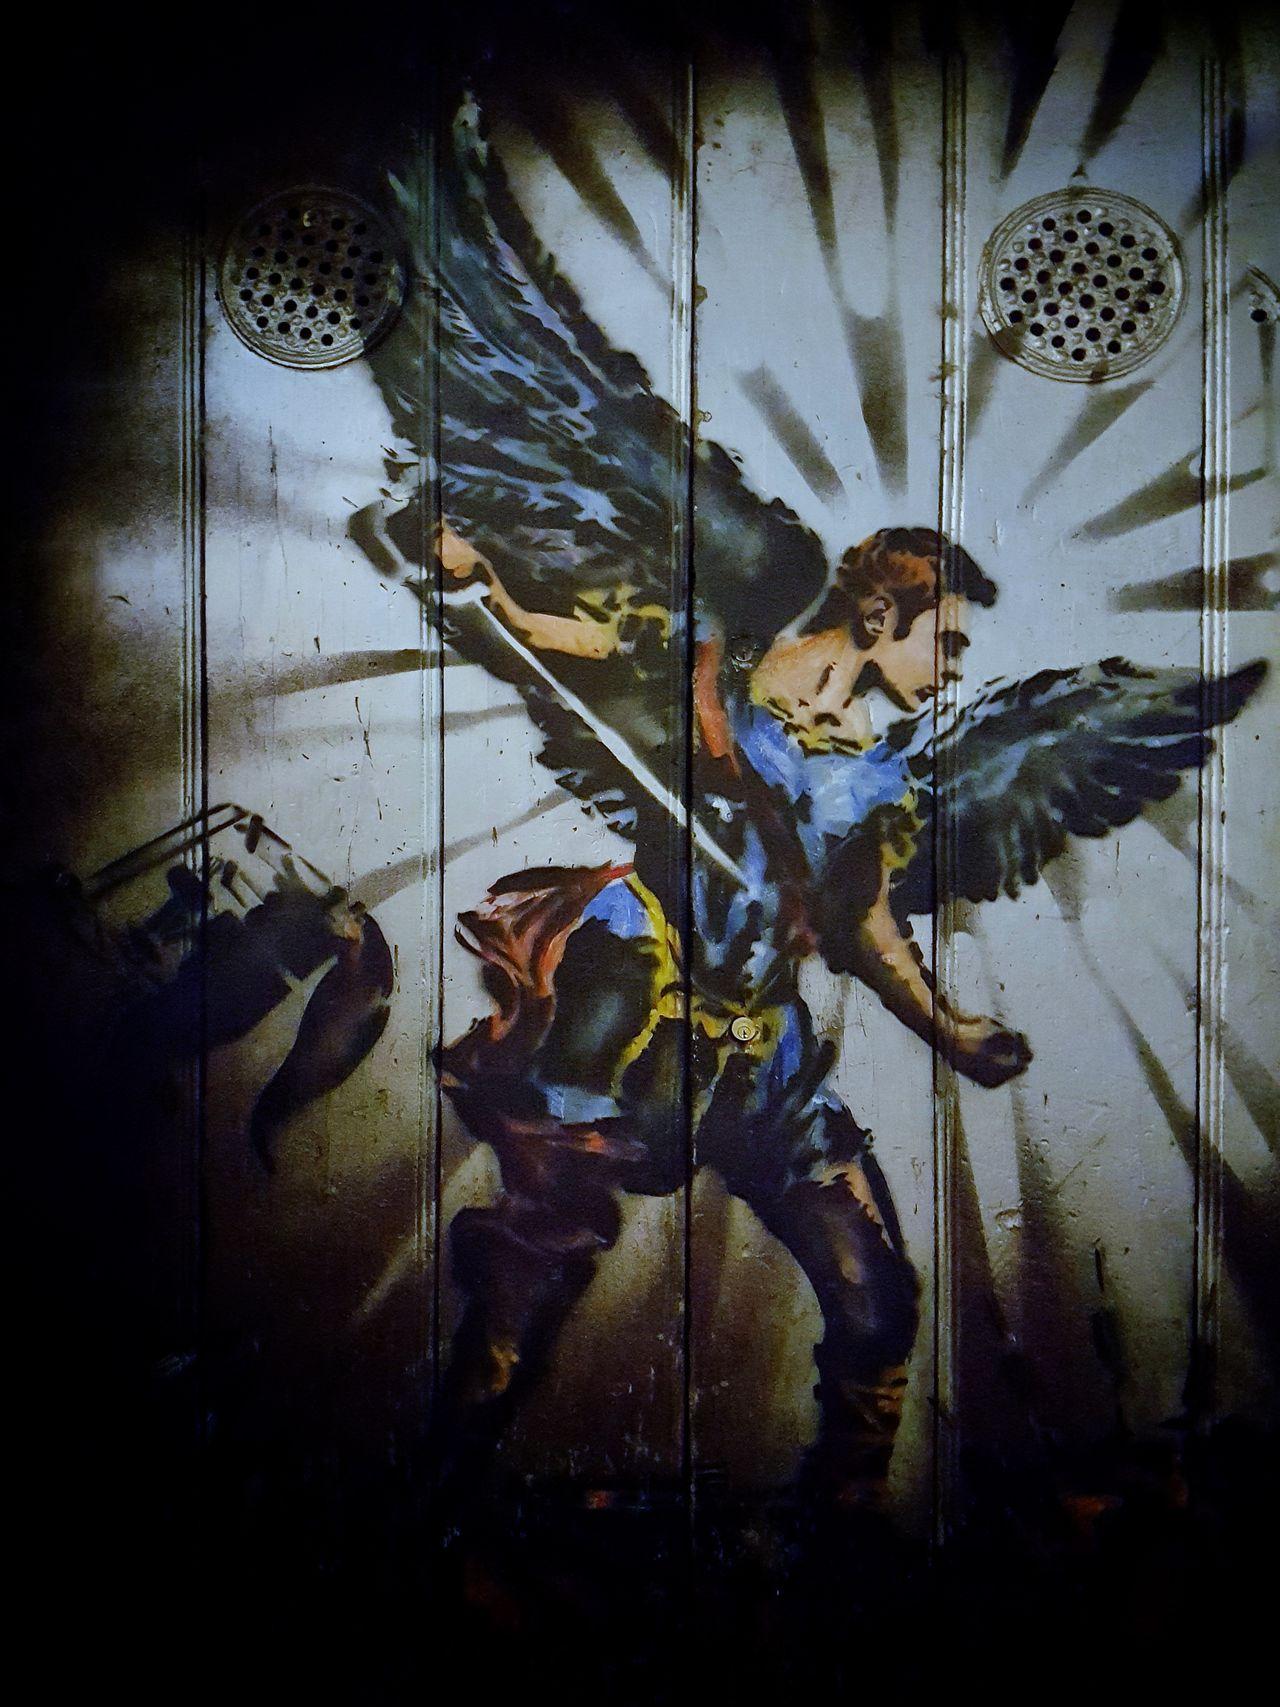 Arcangel Gabriel fighting, bringing light to the darkness Arcangel Gabriel Miguel Angel Fight Sword Light Faith Draw Dramatic Amazing